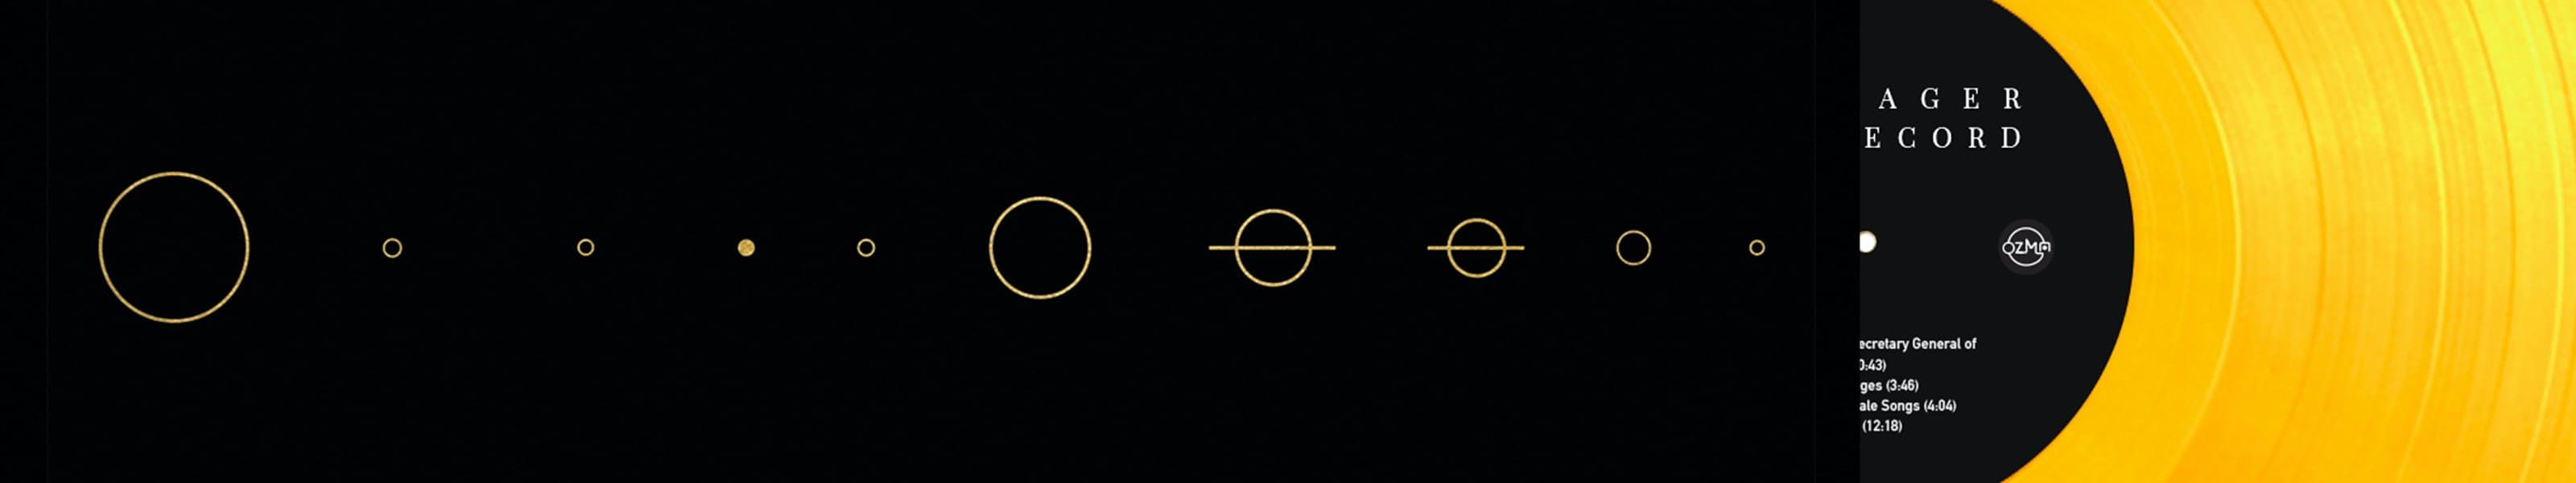 Voyager header 1808.jpg?ixlib=rails 2.1